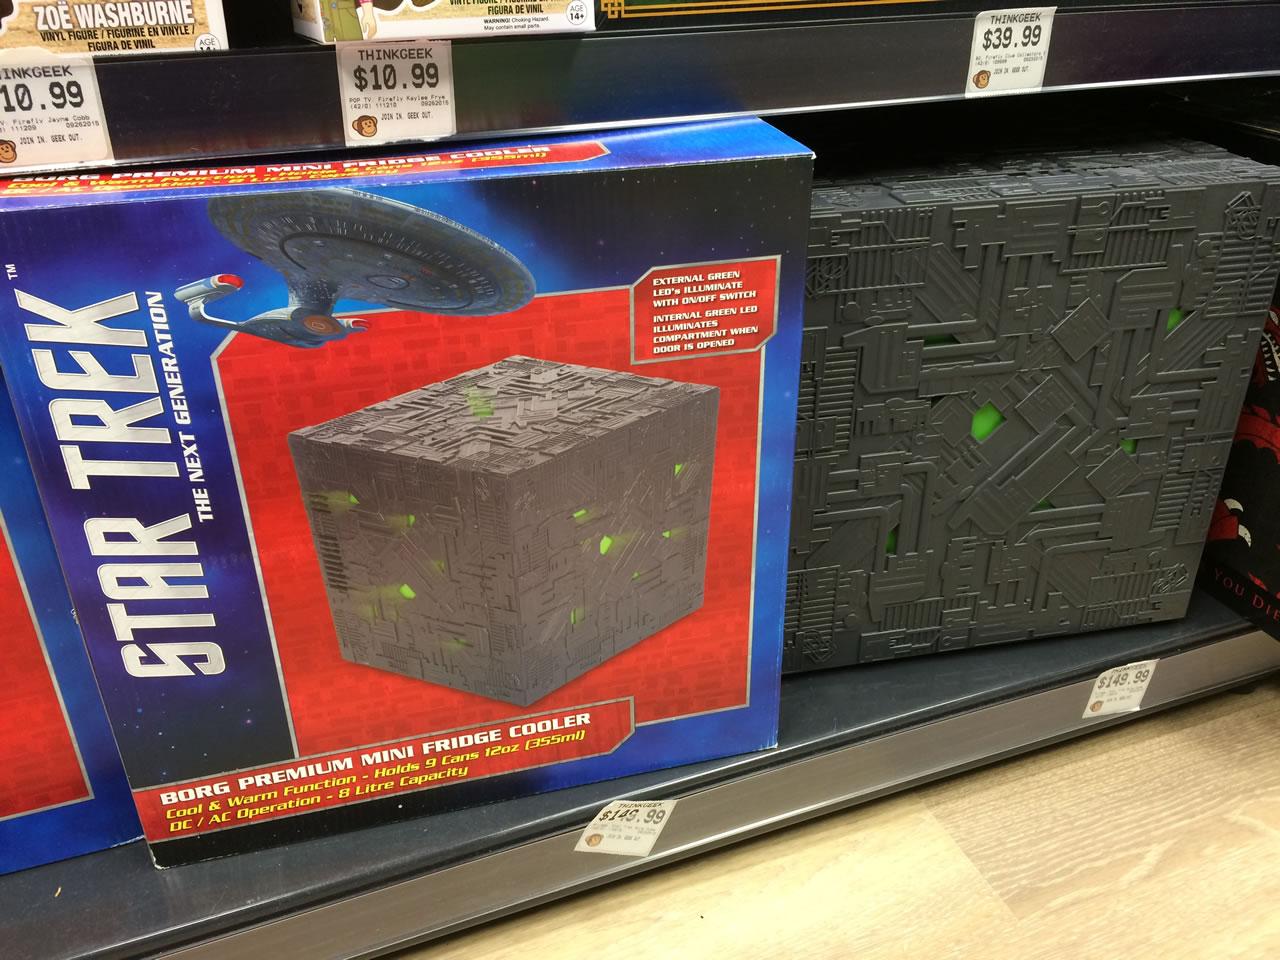 66 thinkgeek store - borg cube fridge